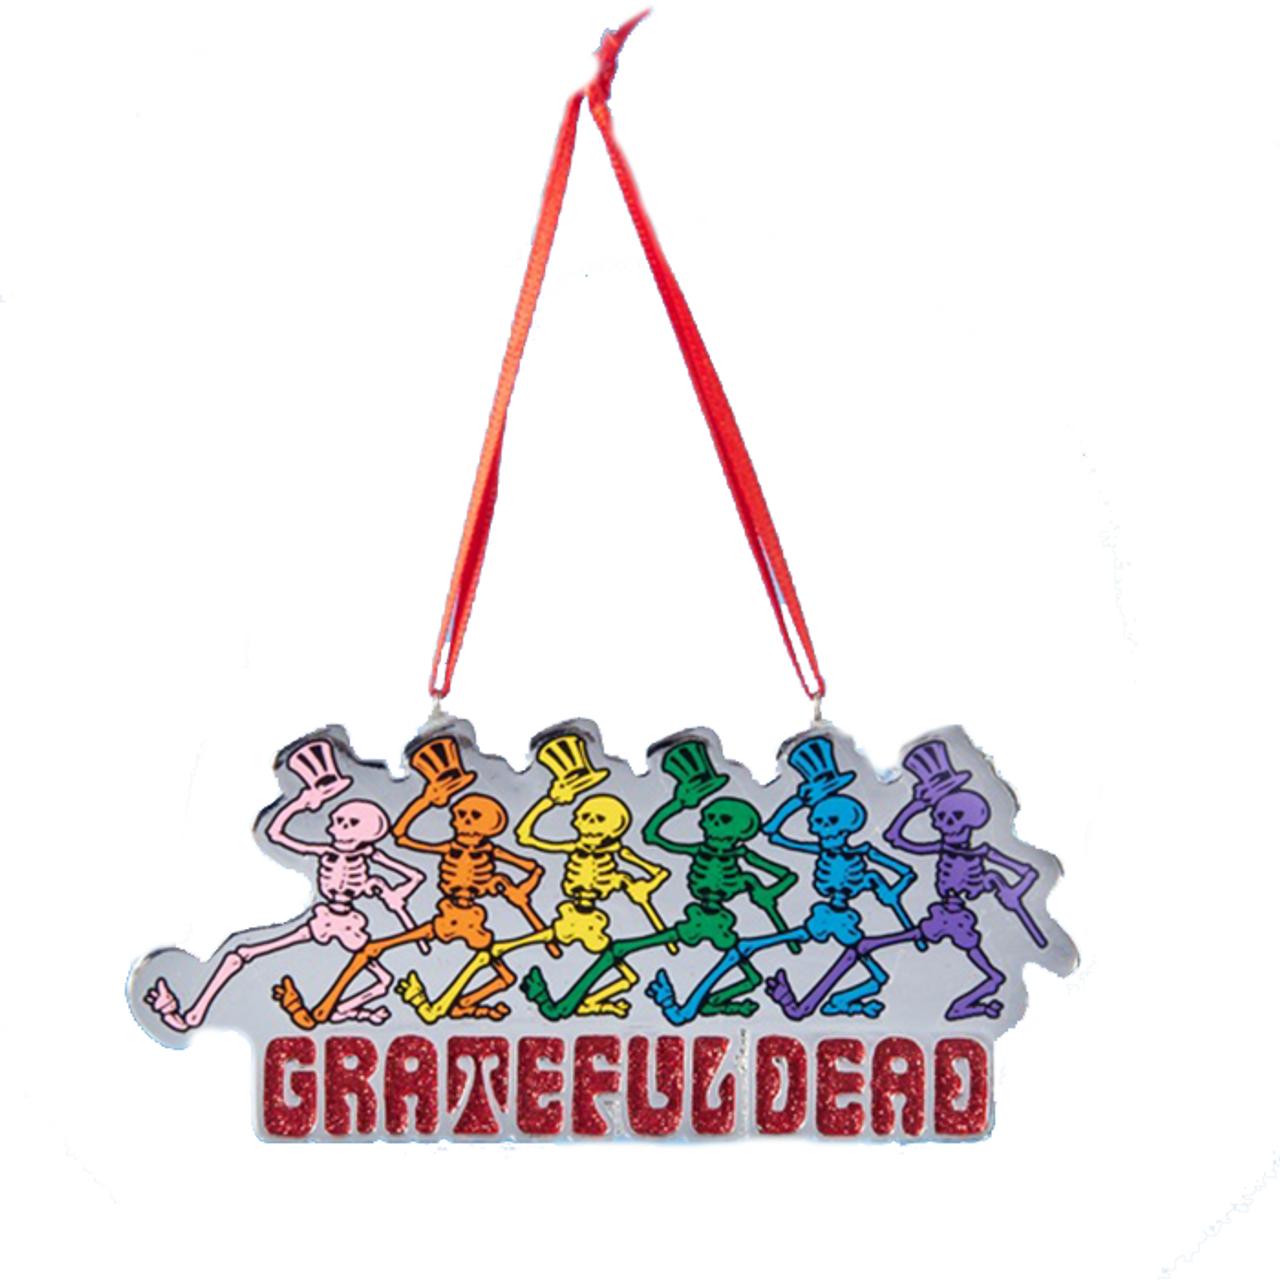 Grateful Dead Christmas Ornament.Grateful Dead Skeletons Christmas Tree Ornament